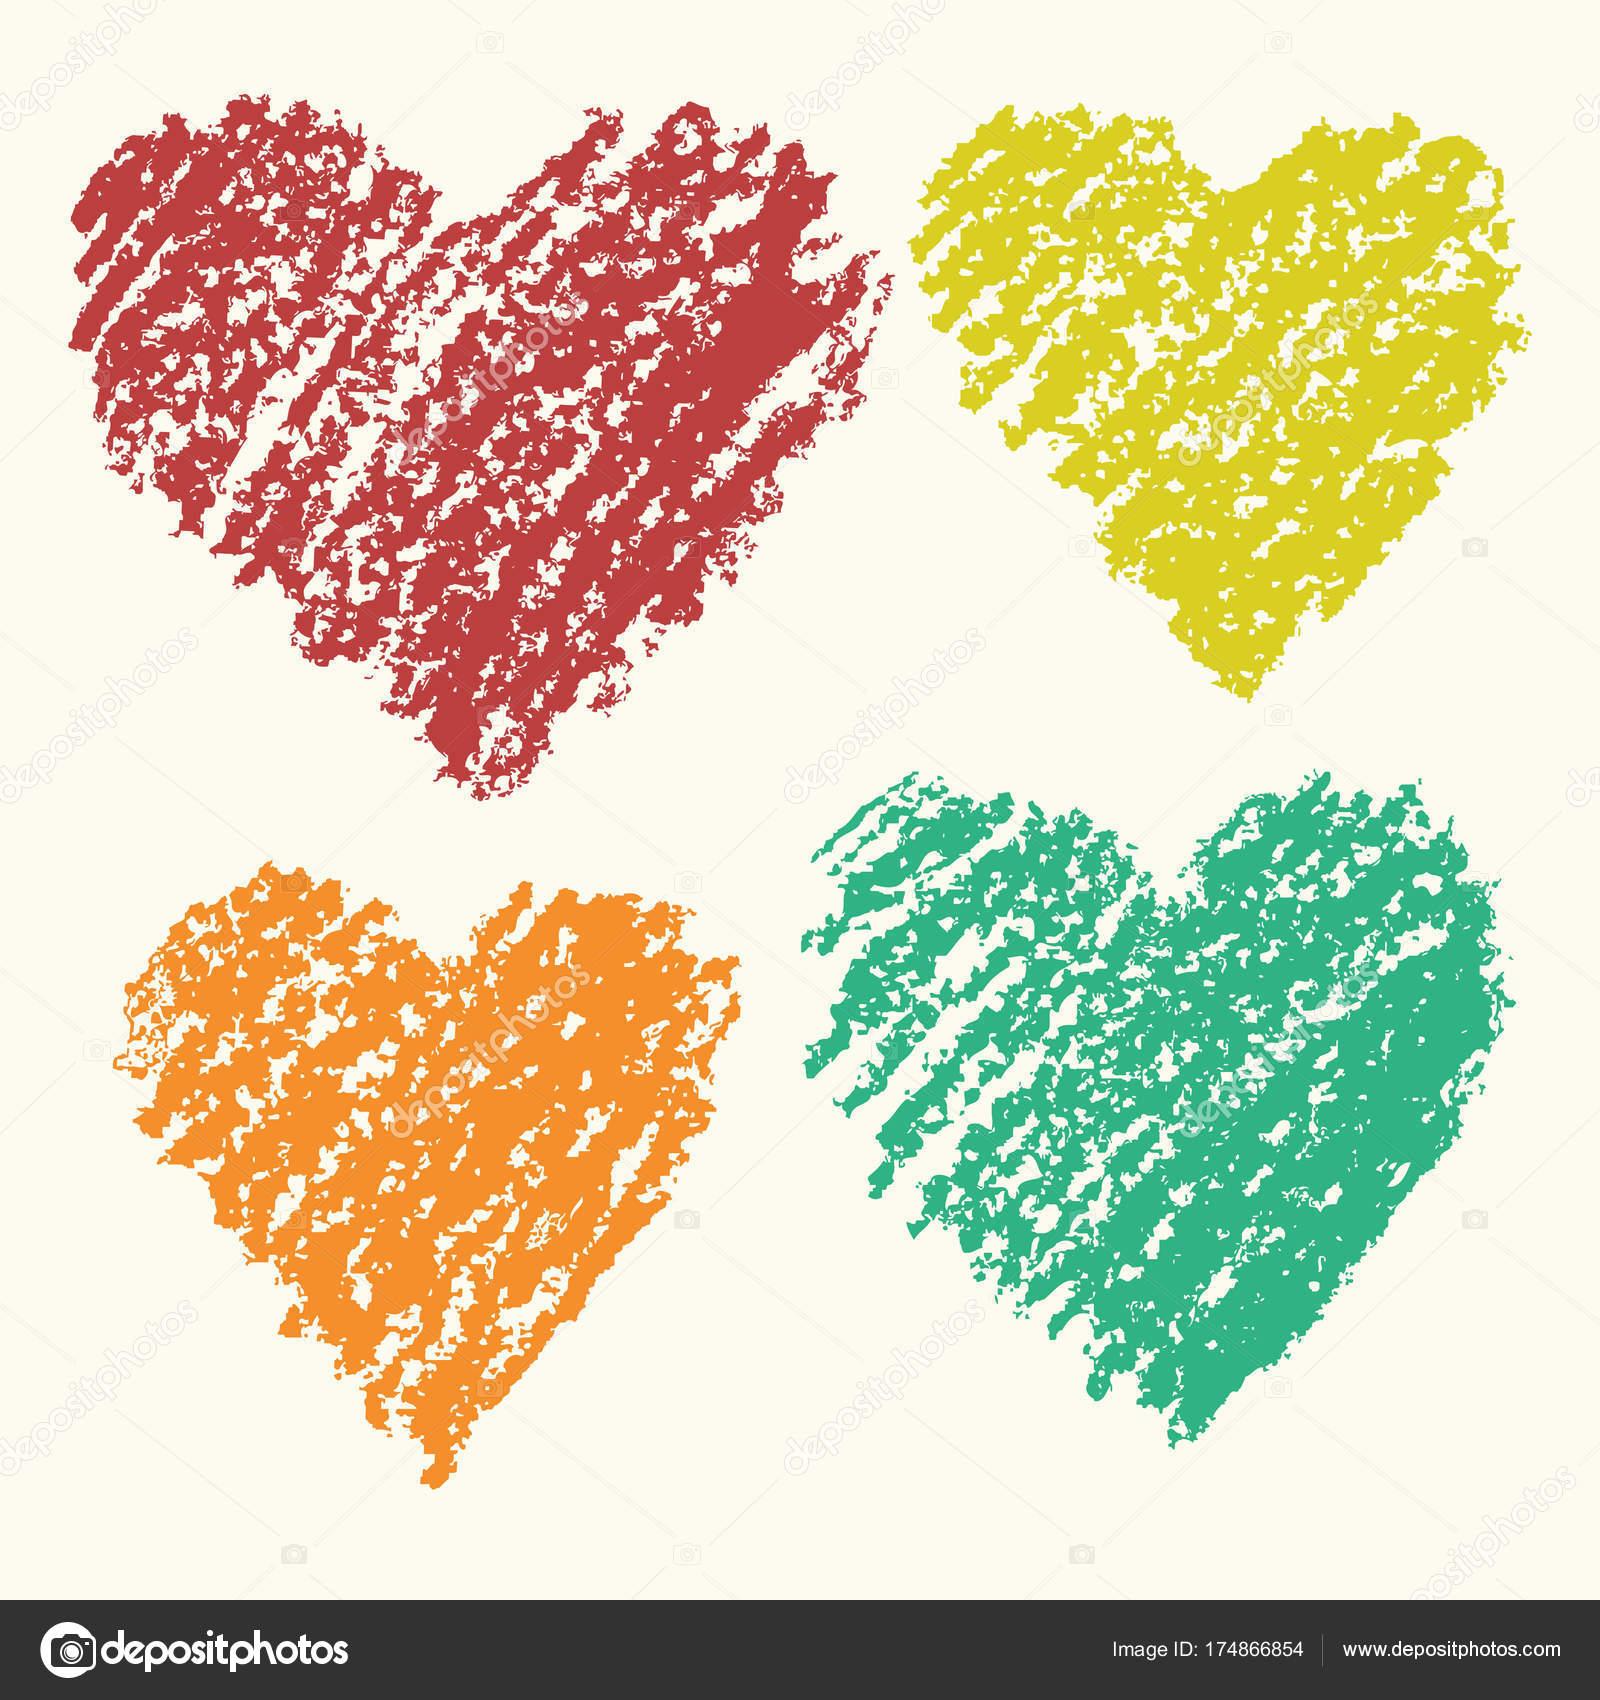 Srdce Tvar Retro Barva Umeni Tahy Pastelka Rucni Kresleni Sady